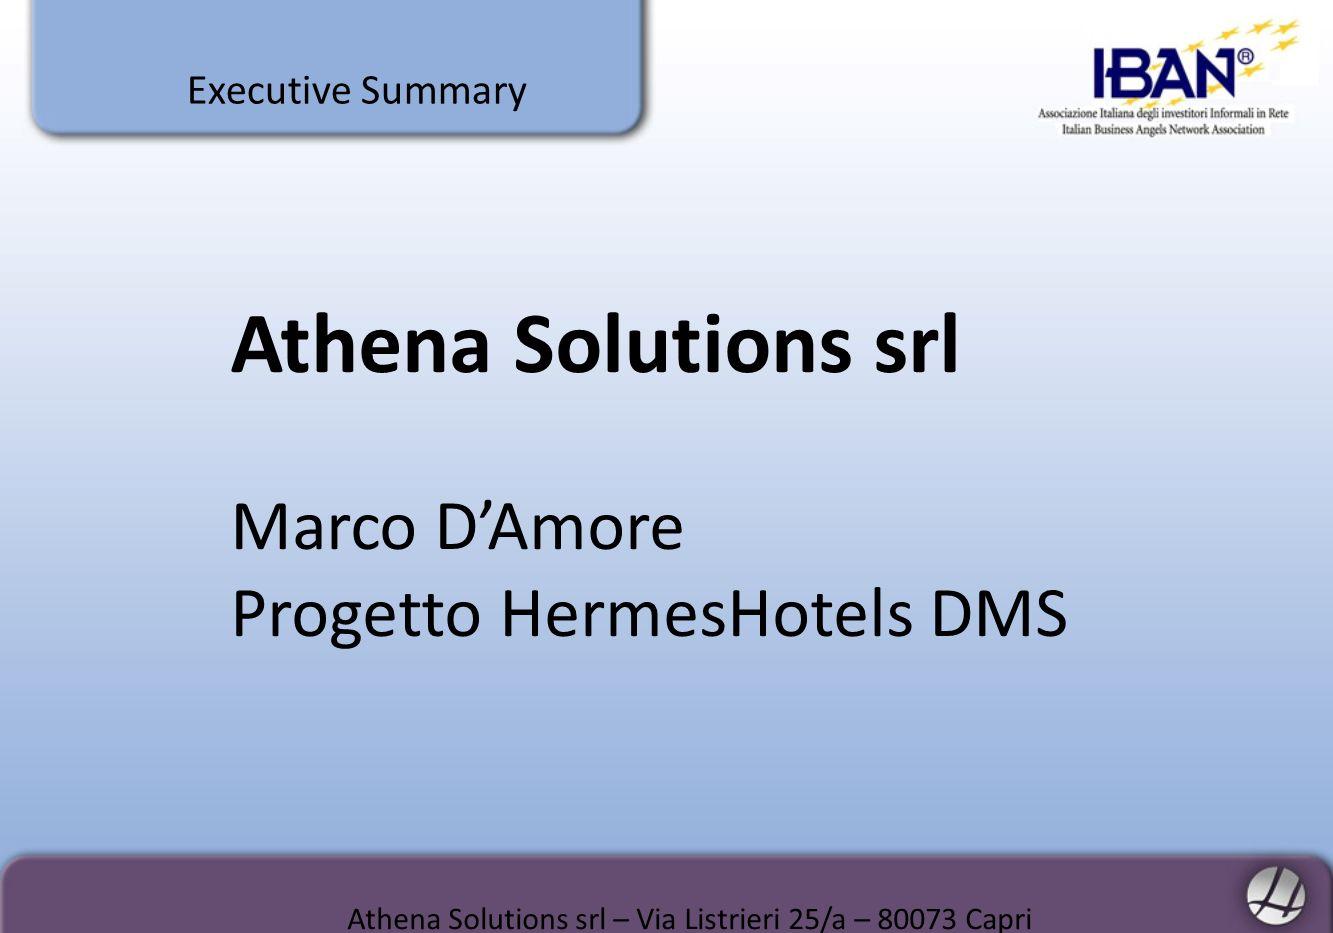 WHAT WE ASK FOR FUNDING AND SKILLS REQUIRED Athena Solutions srl – Via Listrieri 25/a – 80073 Capri FUNDING 2011: 200.000 2012: 150.000 DA ALLOCARE NELLE SEGUENTI AREE: AREA IT: 30% AREA SALES & MARKETING: 65% AREA OTHERS: 5% COMPETENZE RICHIESTE ALLINVESTITORE: SALES & MARKETING – COMPETENZA PRIMARIA IT - COMPETENZA SECONDARIA ORGANIZATIONAL -COMPETENZA TERZIARIA